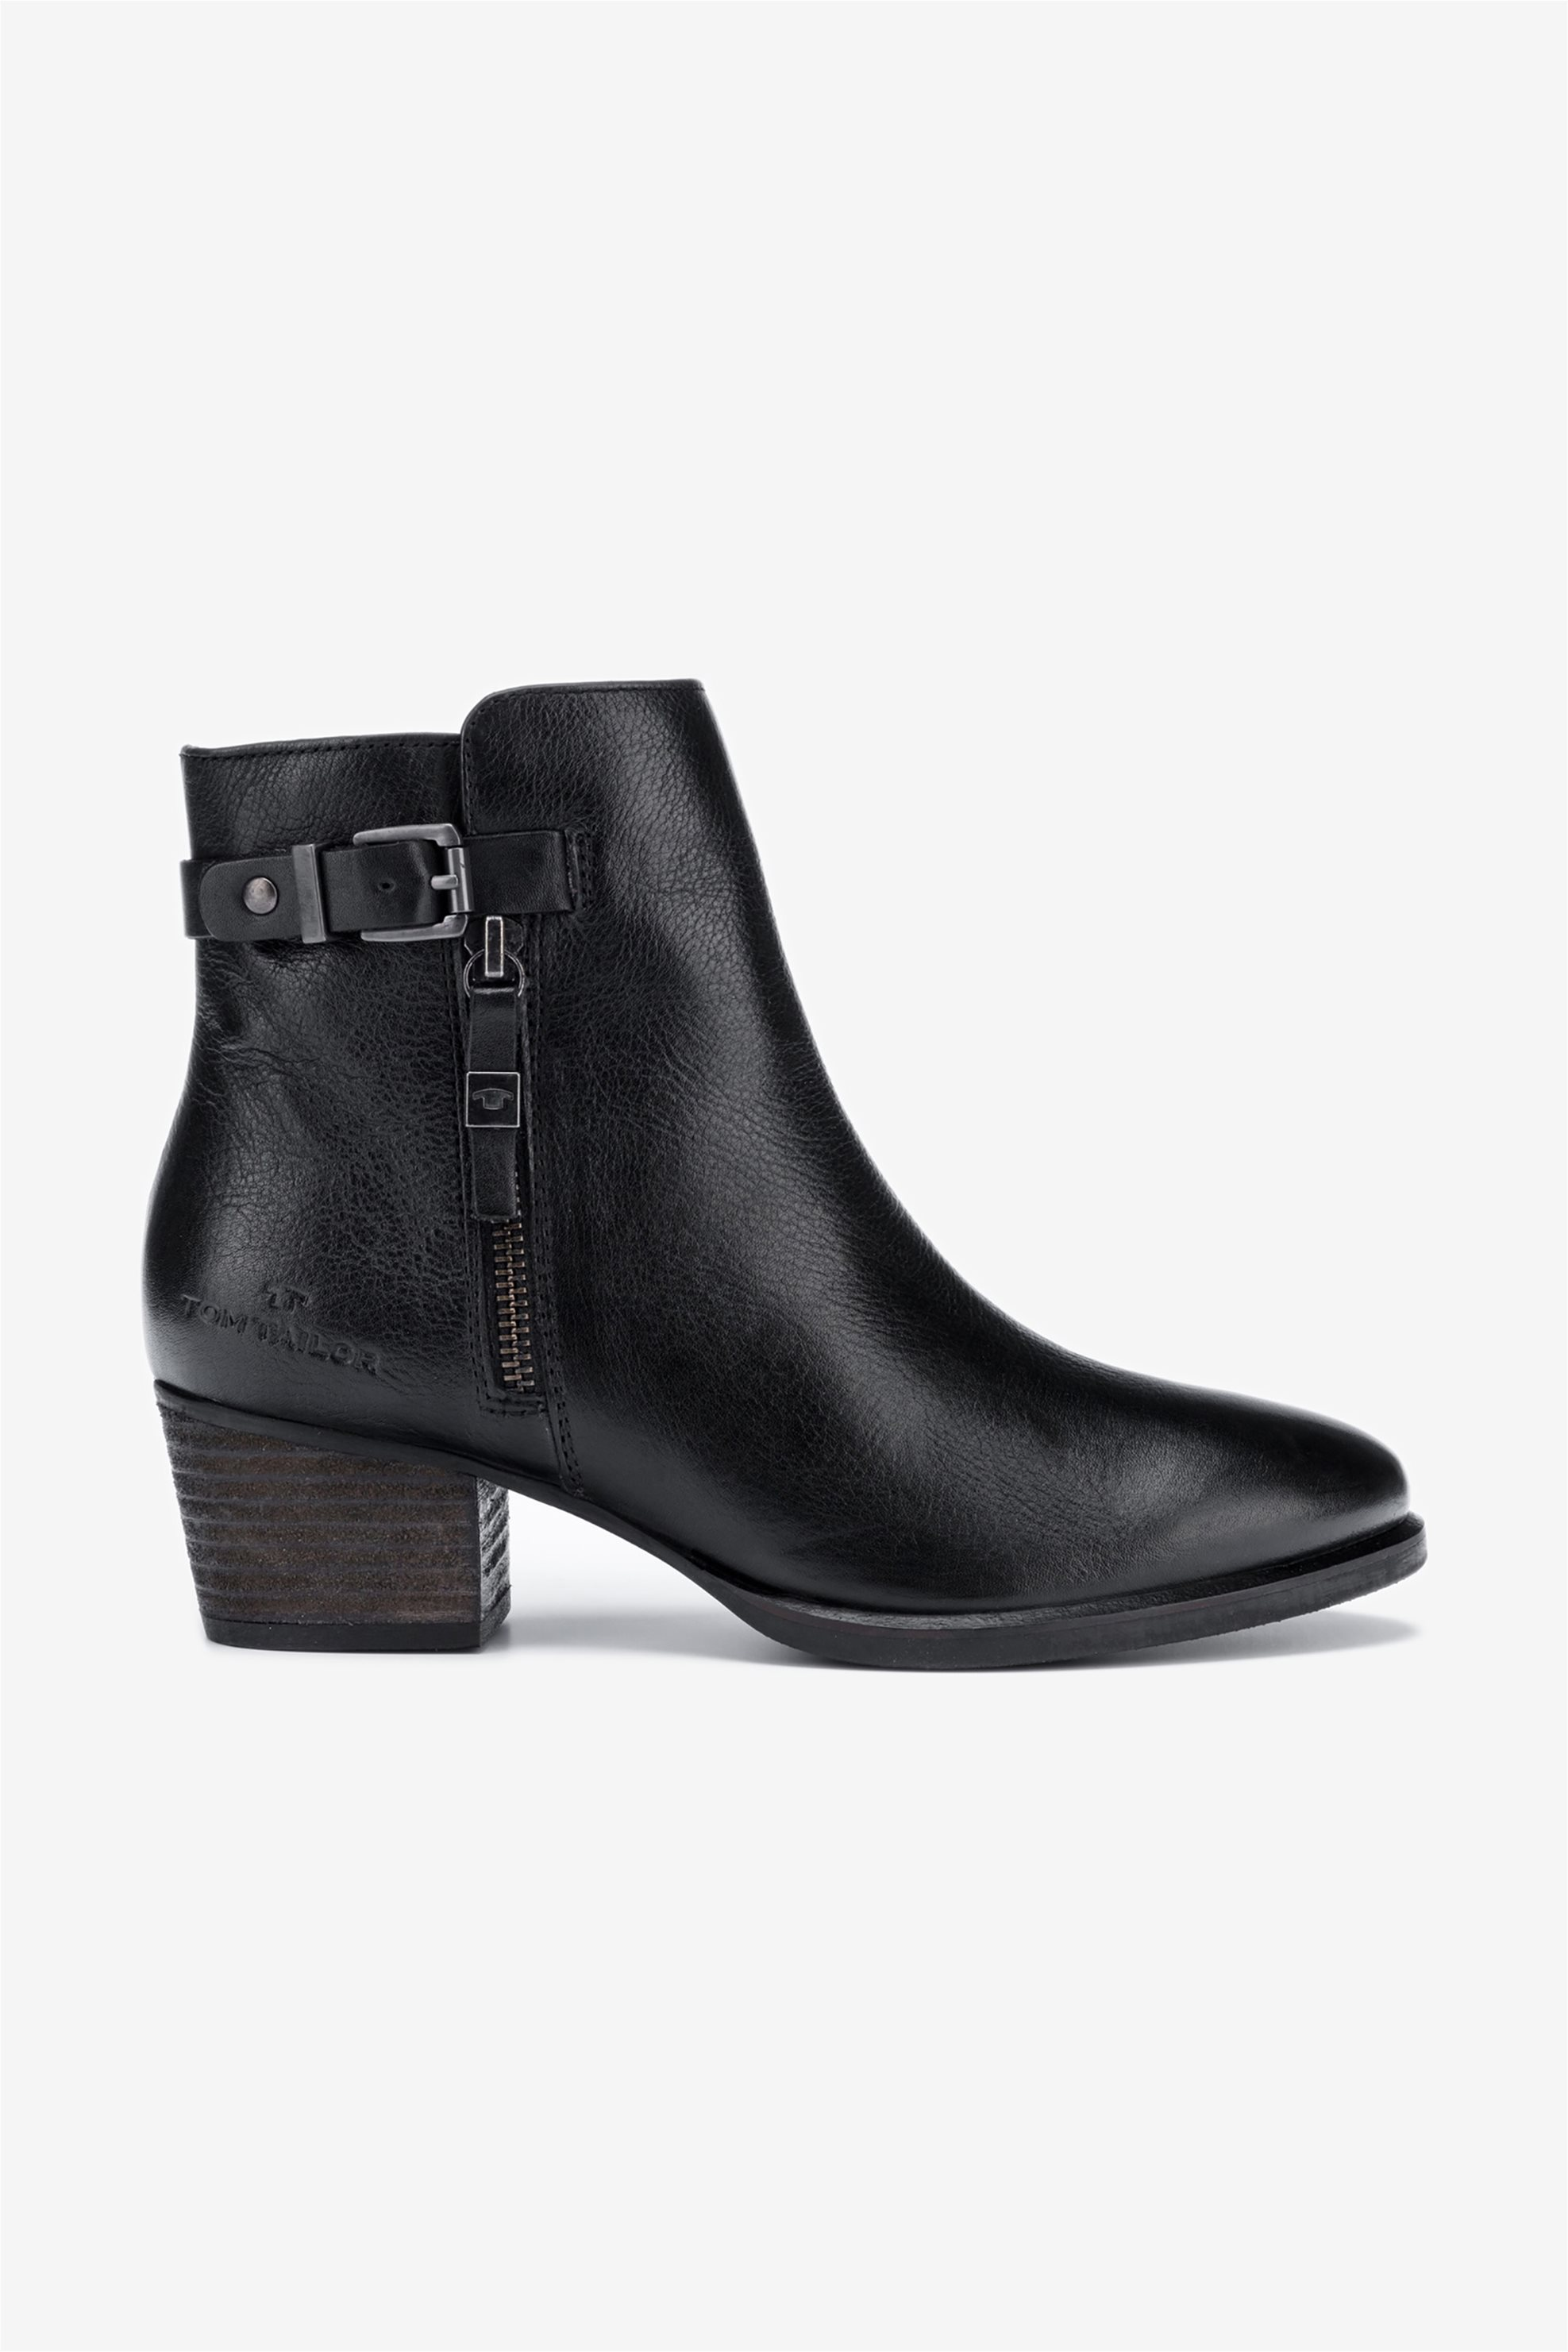 Tom Tailor γυναικεία δερμάτινα μποτάκια με τακούνι – 7999402 – Μαύρο